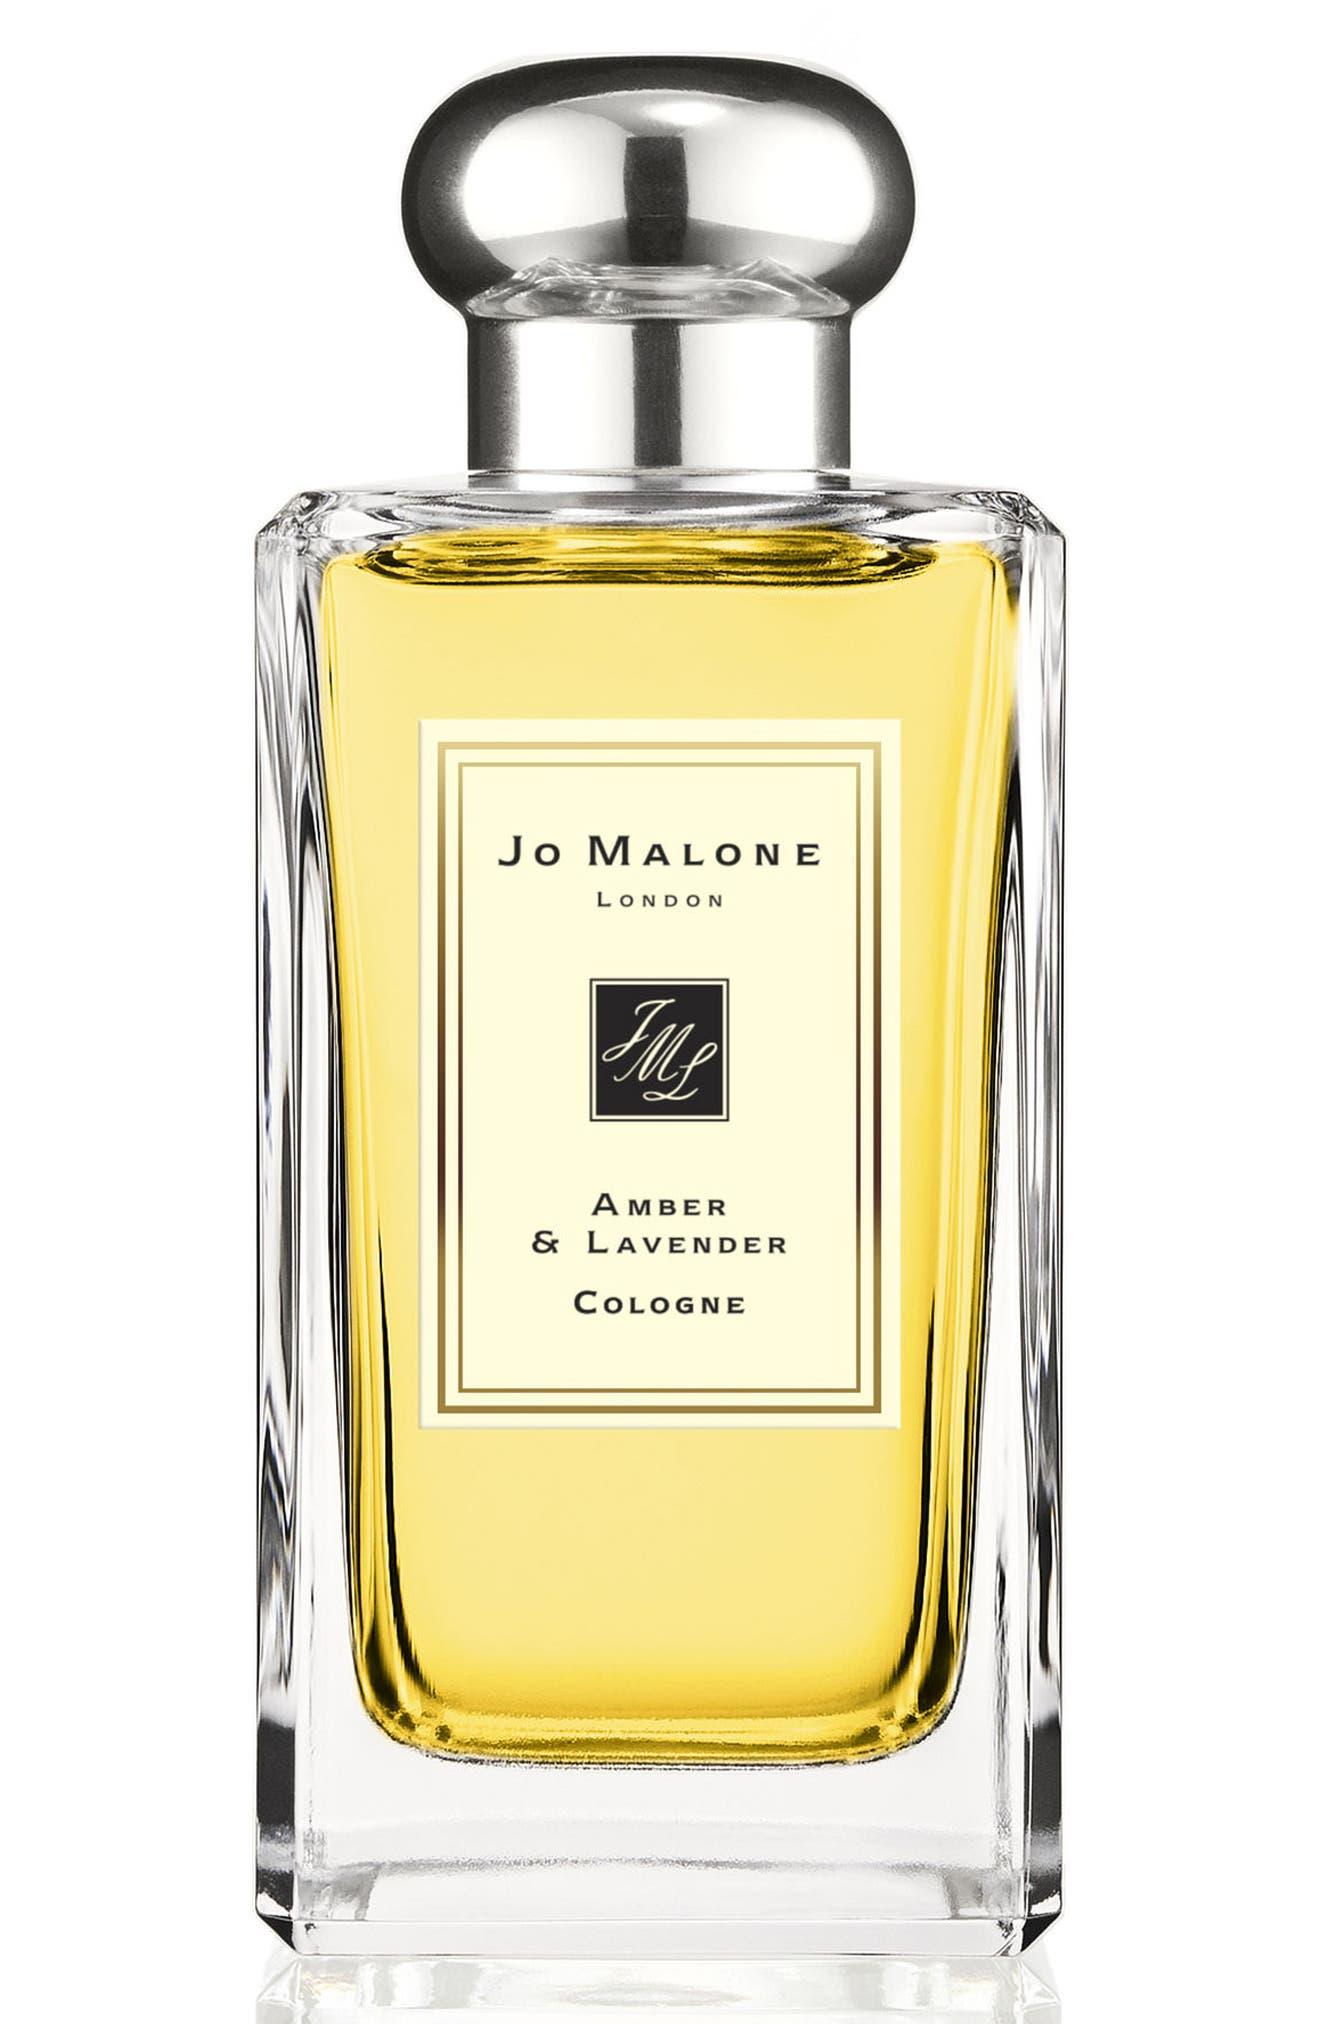 Jo Malone London™ Amber & Lavender Cologne (3.4 oz.)